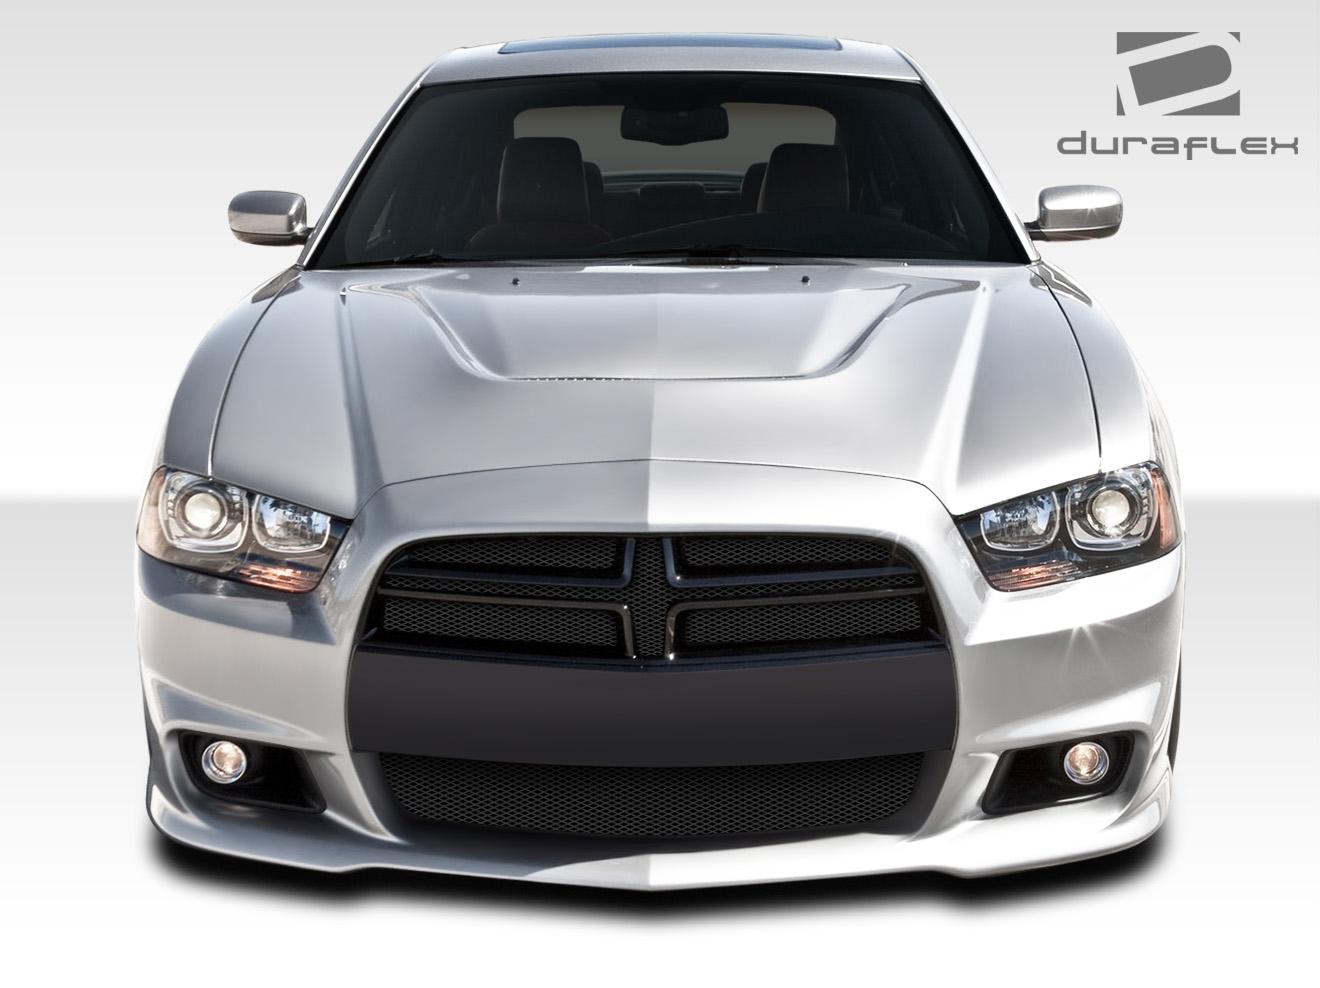 07 dodge charger srt8 front bumper